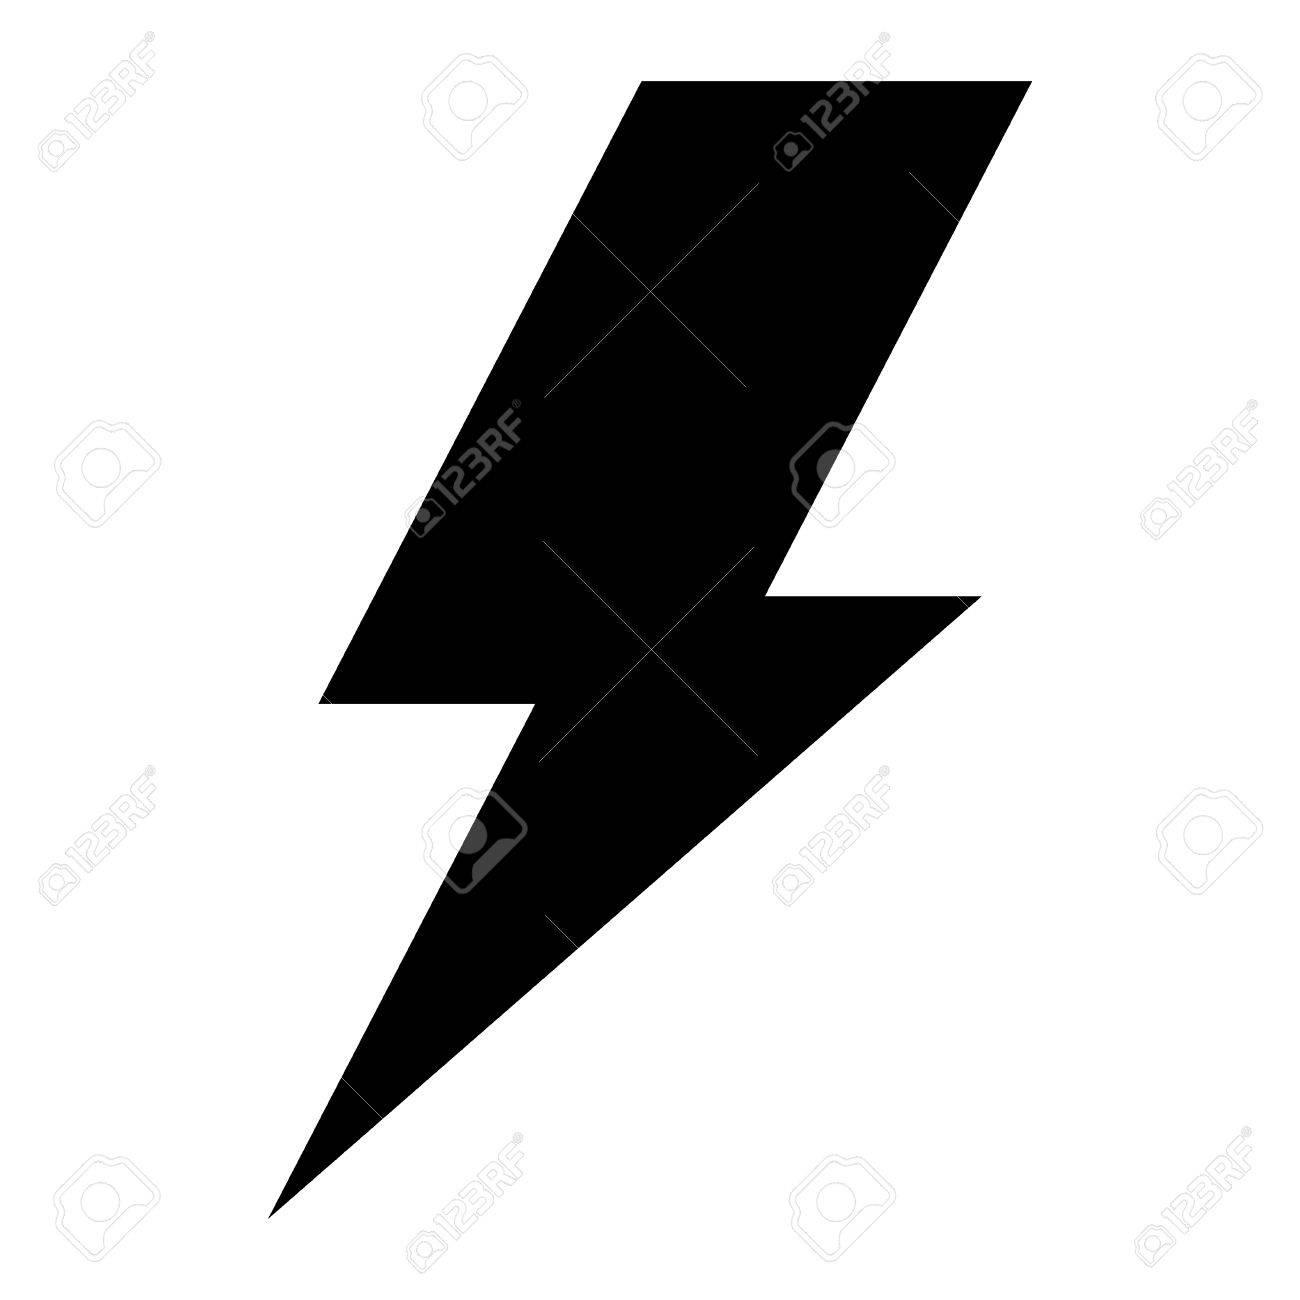 lightning bolt vector icon royalty free cliparts vectors and stock rh 123rf com lightning bolt vector illustrator lightning bolt vector icon